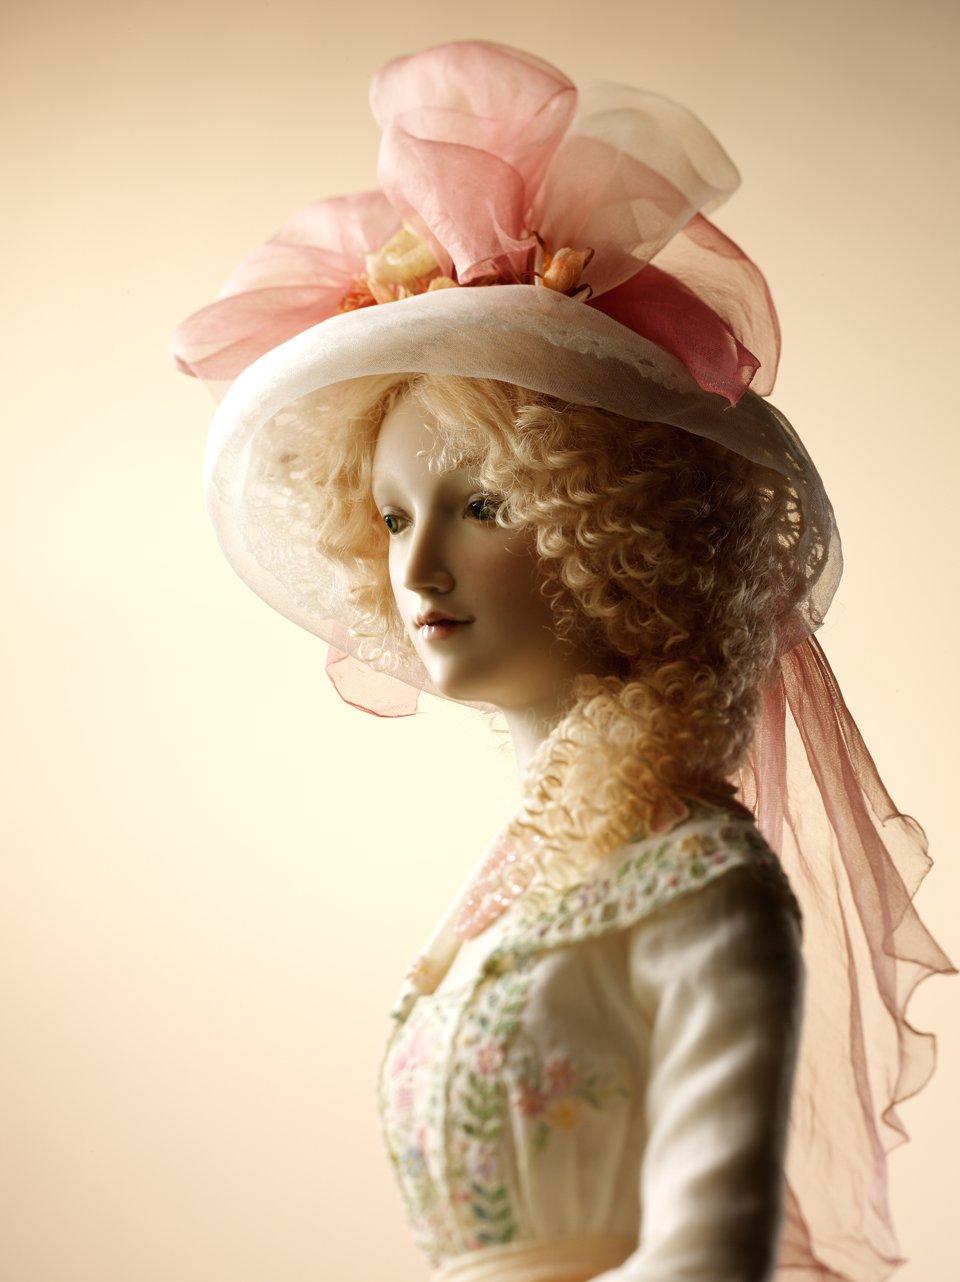 Alexandra-Kokinova-muneca-hecha-a-mano-Martha-1910-detalle-sombrero-cara